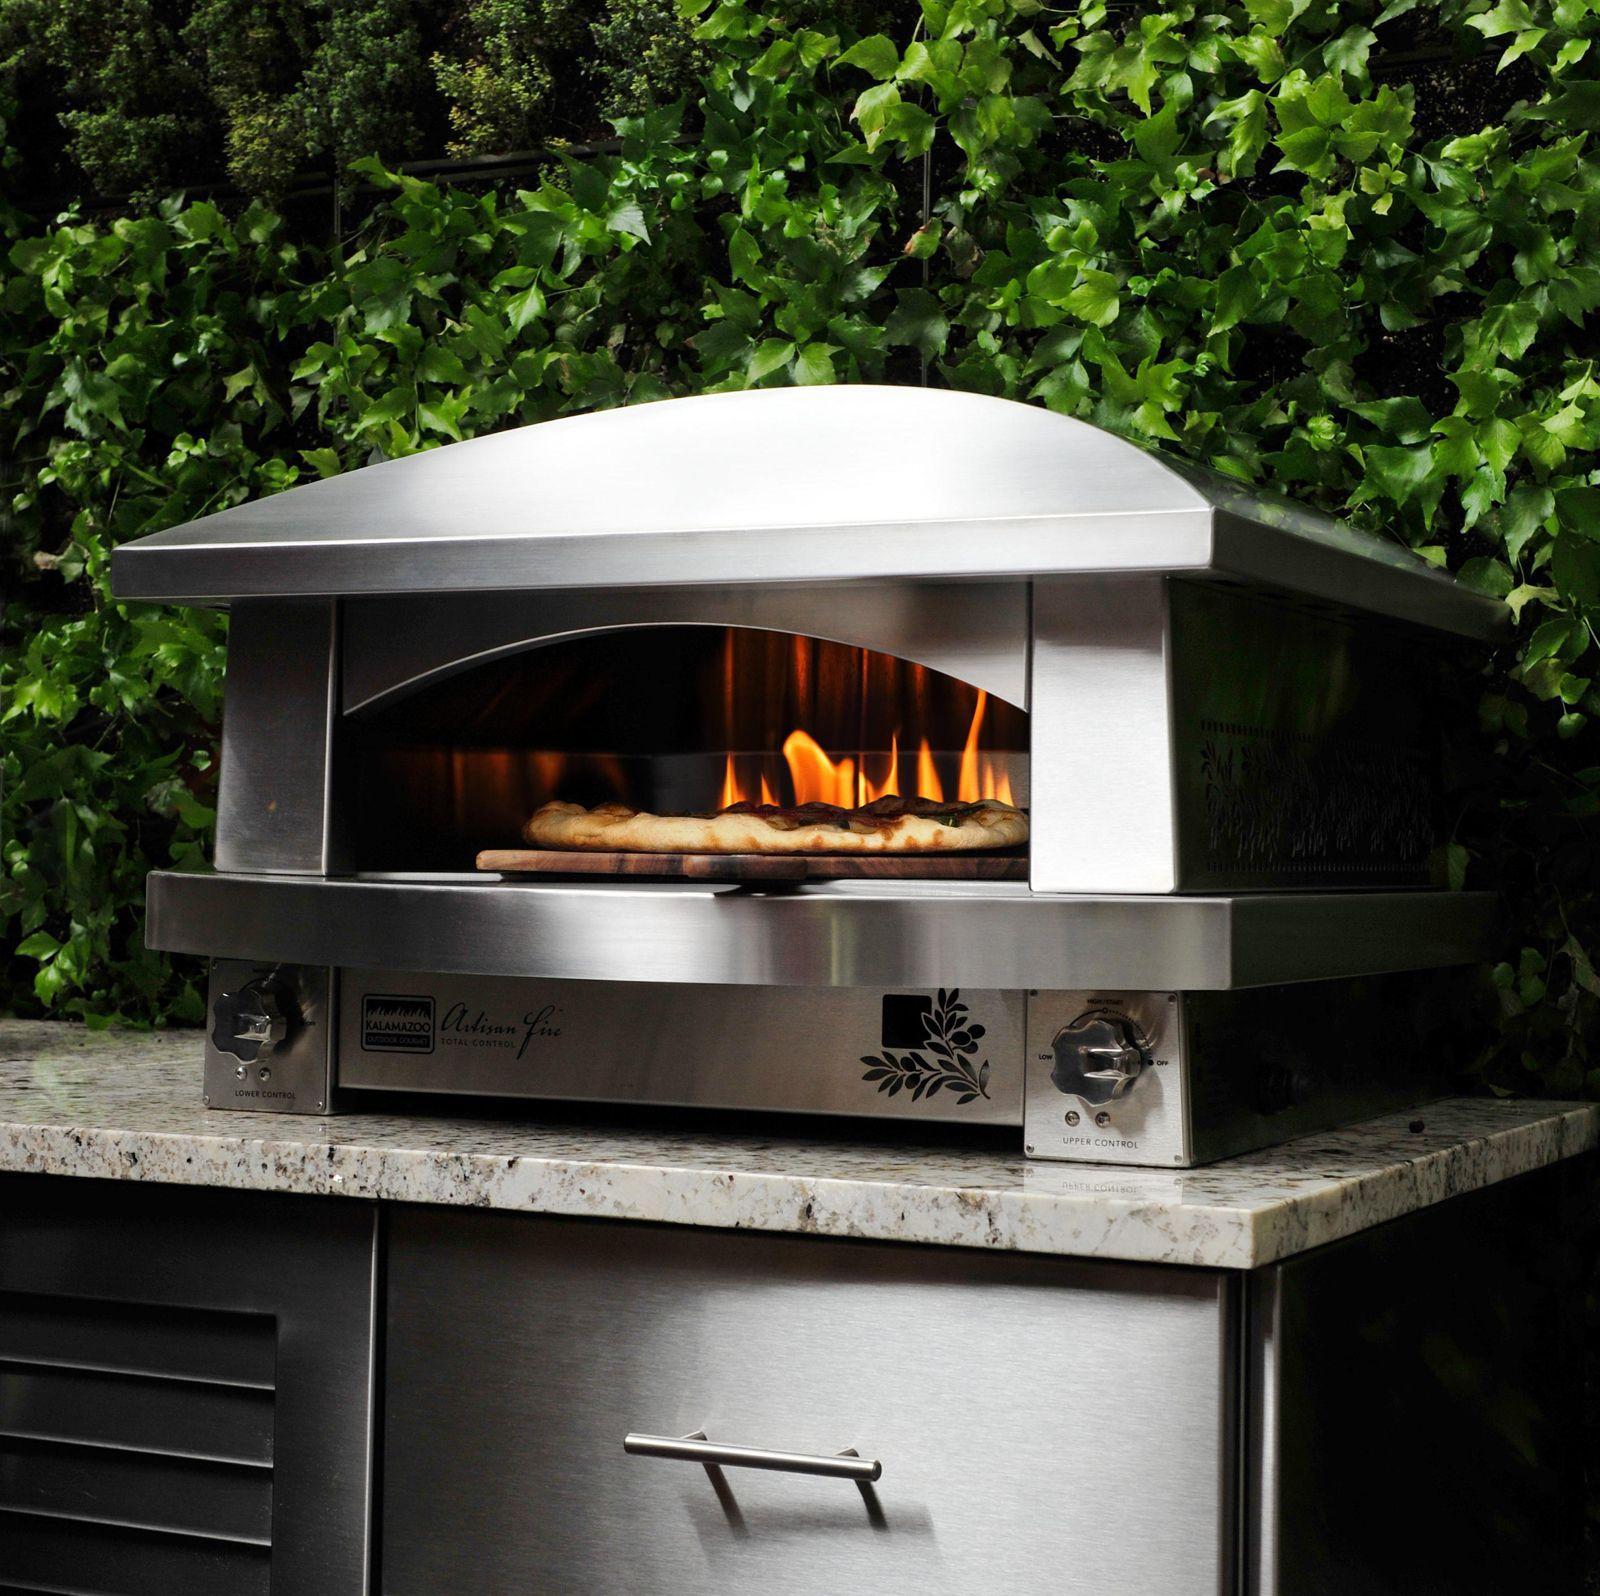 Artisan Pizza Kitchen: Kalamazoo Outdoor Gourmet Grills